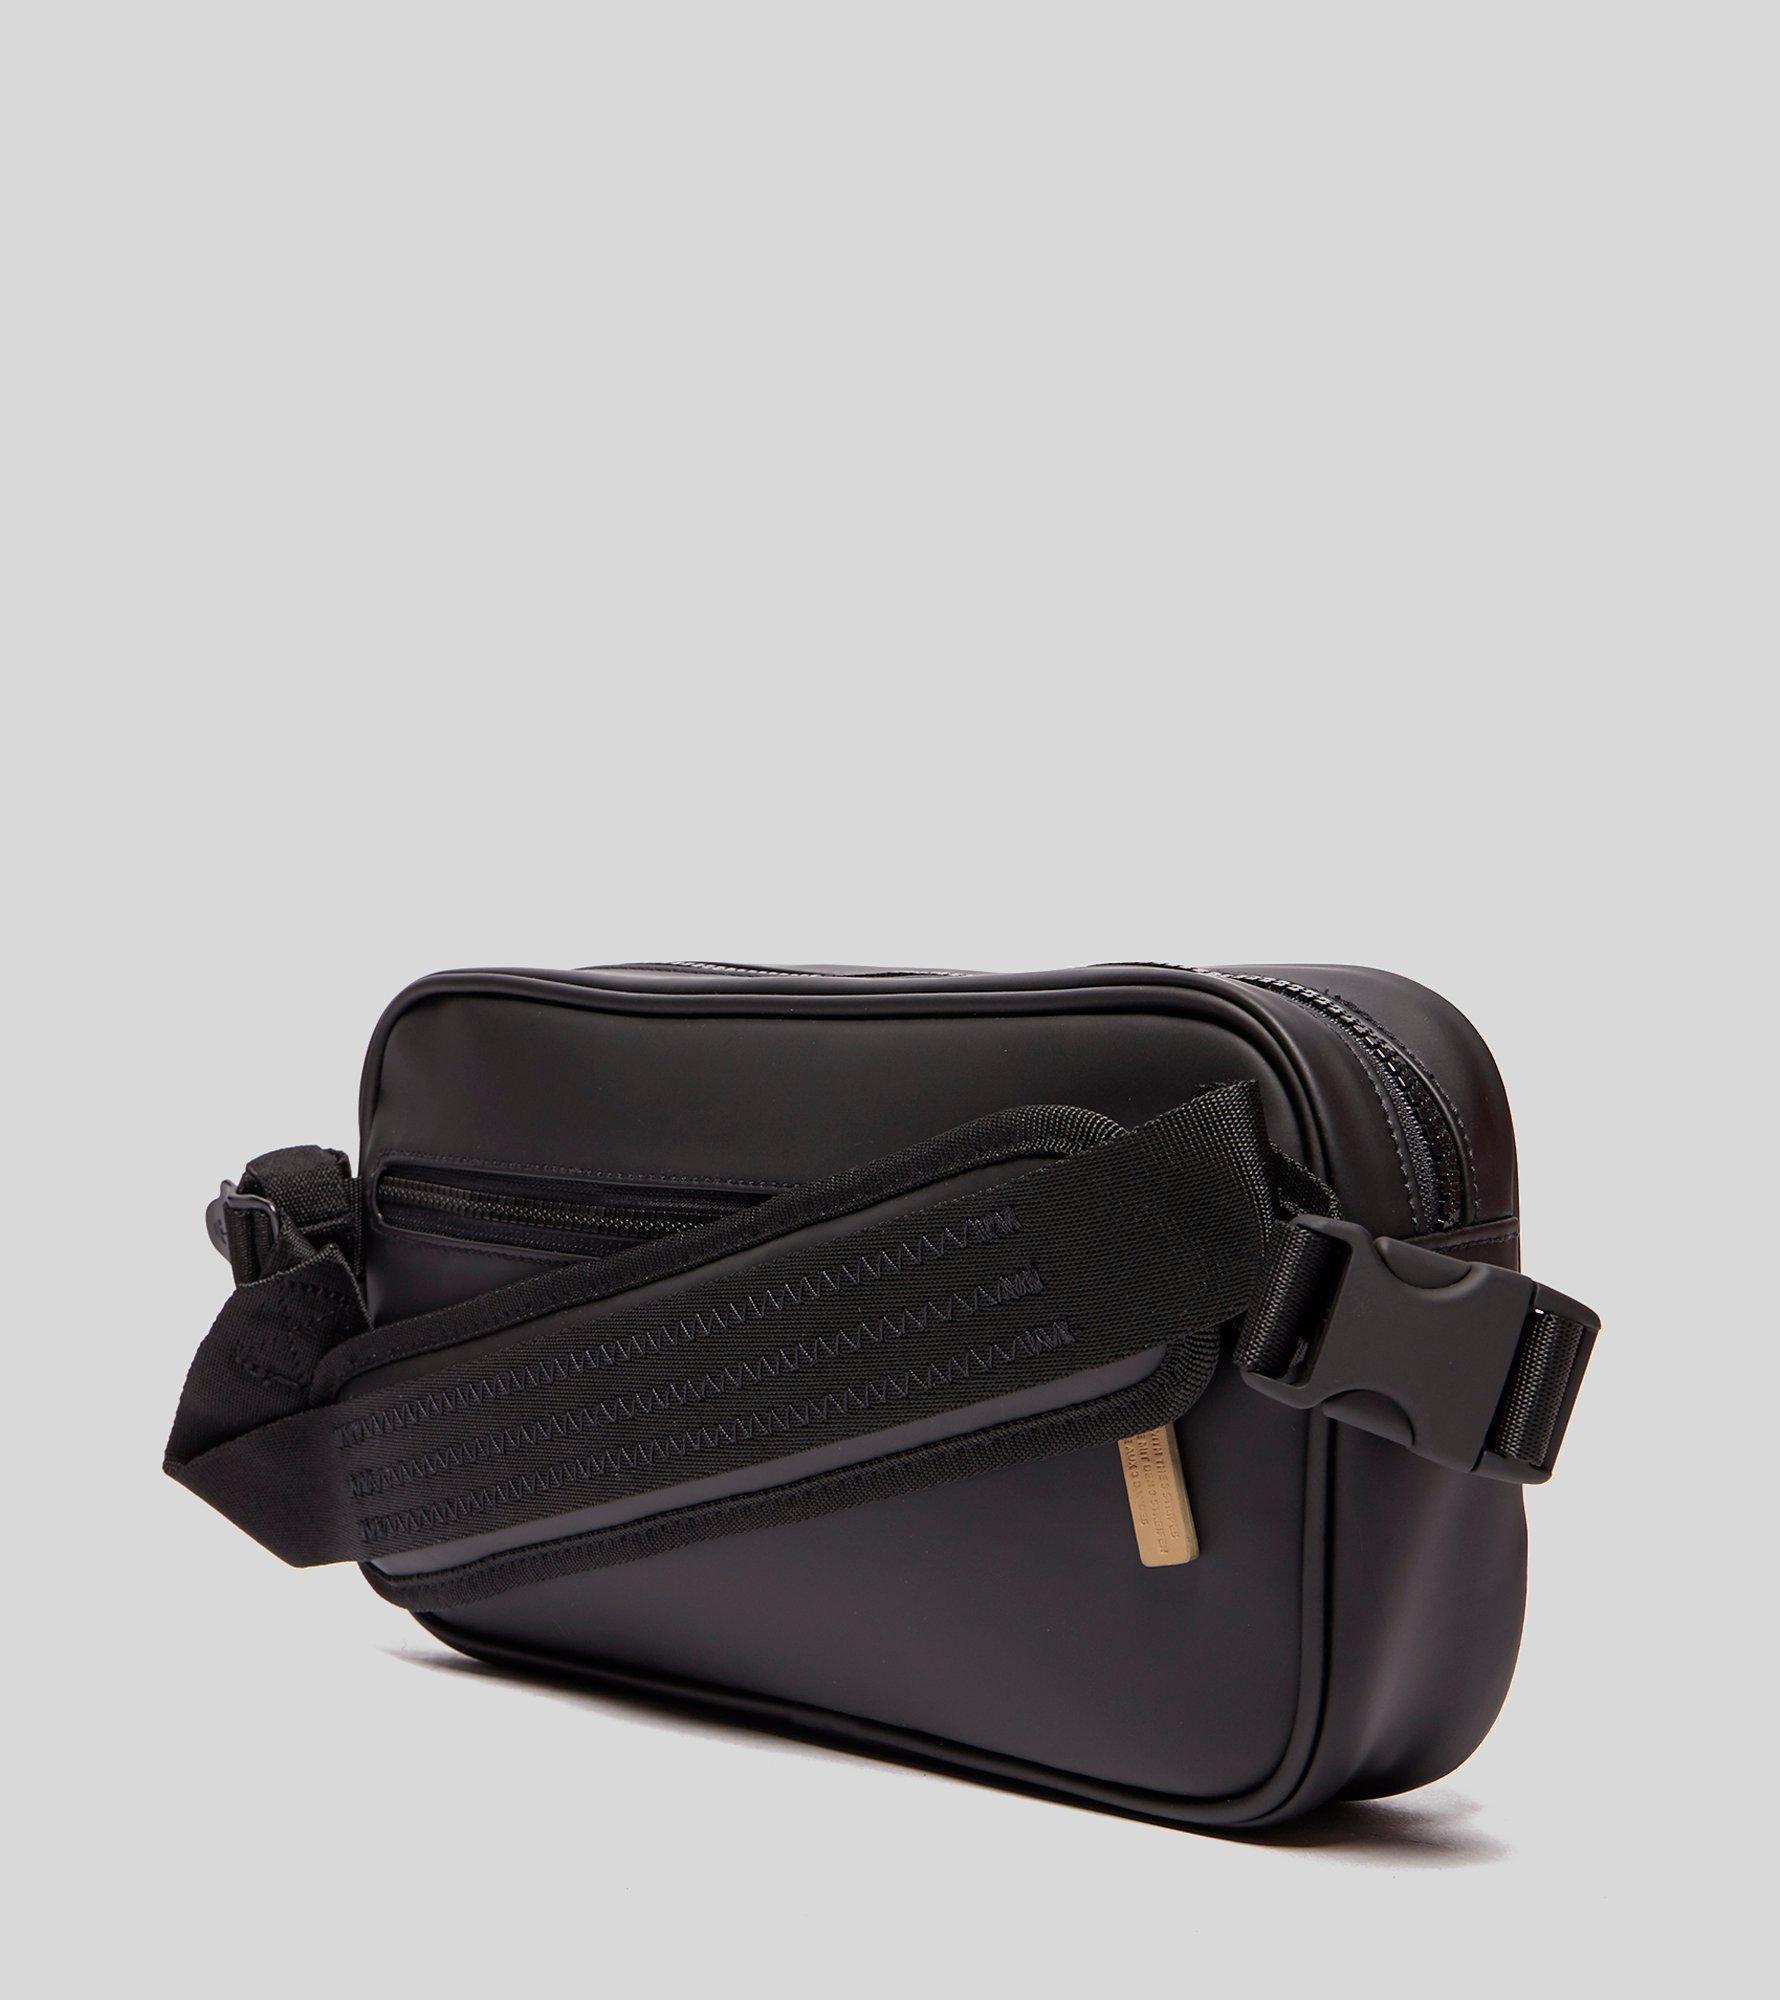 fc0f61433e75 adidas Originals Nmd Side Bag in Black for Men - Lyst